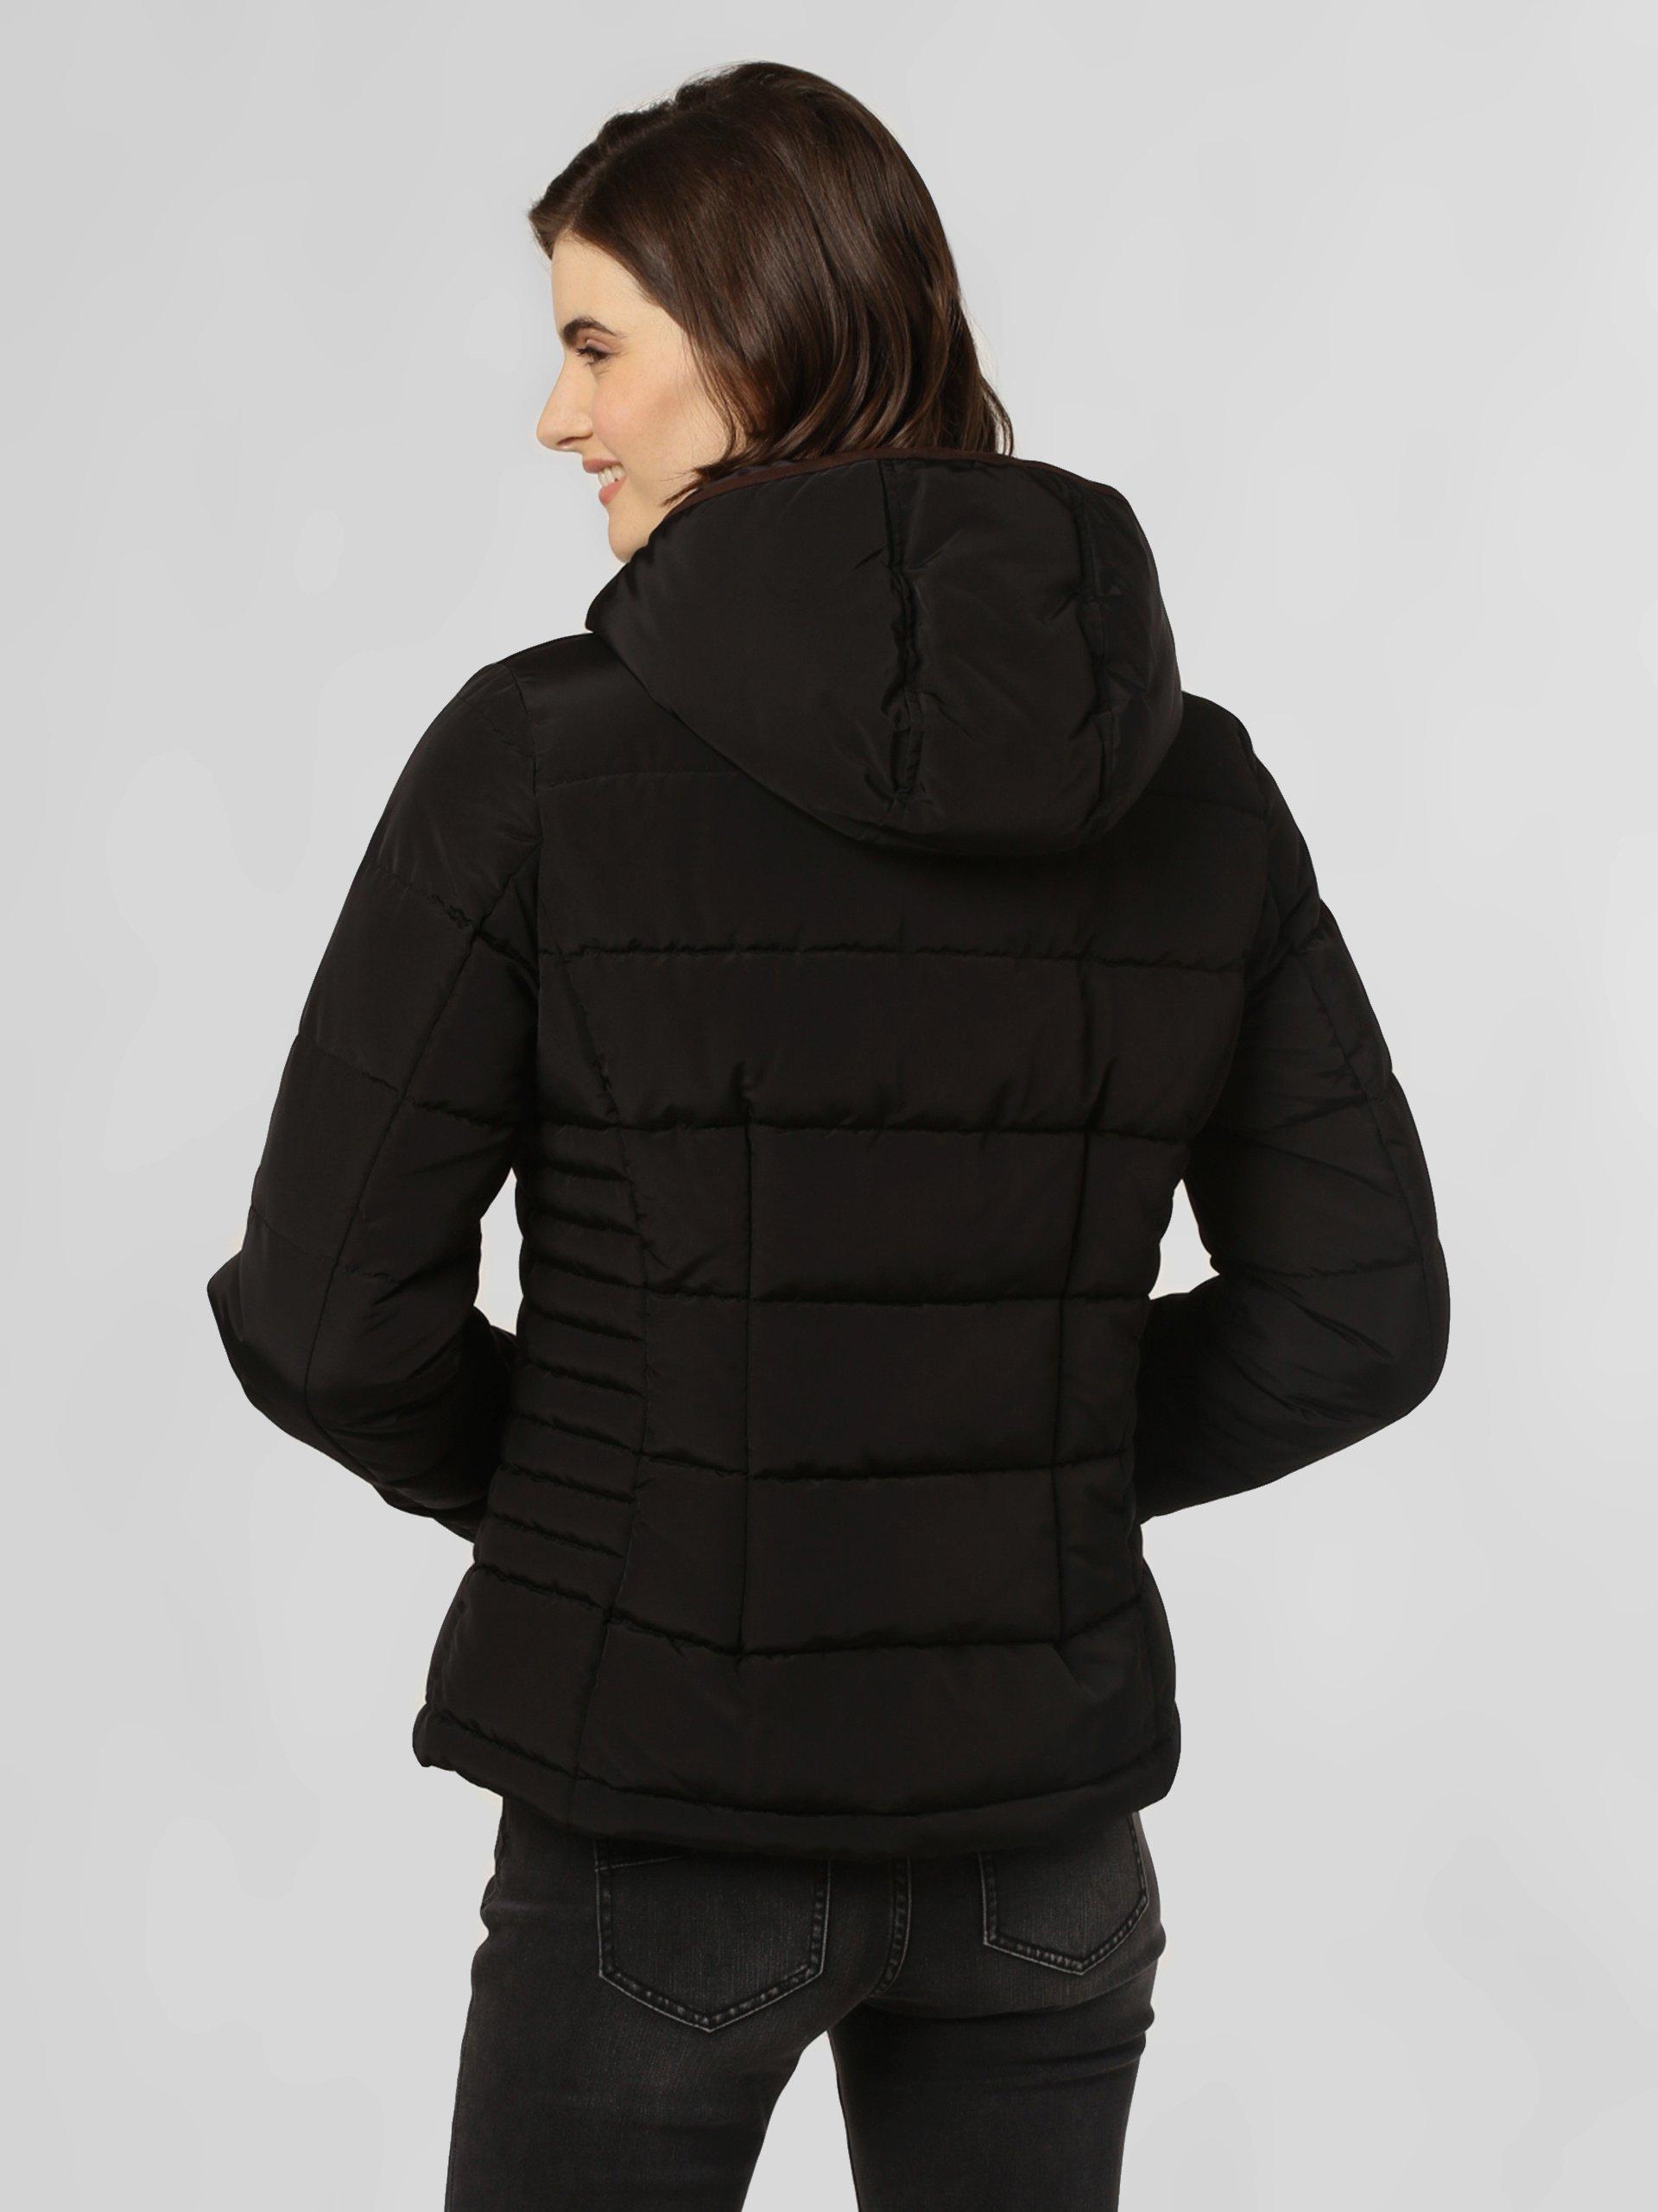 Marie Lund Damska kurtka pikowana